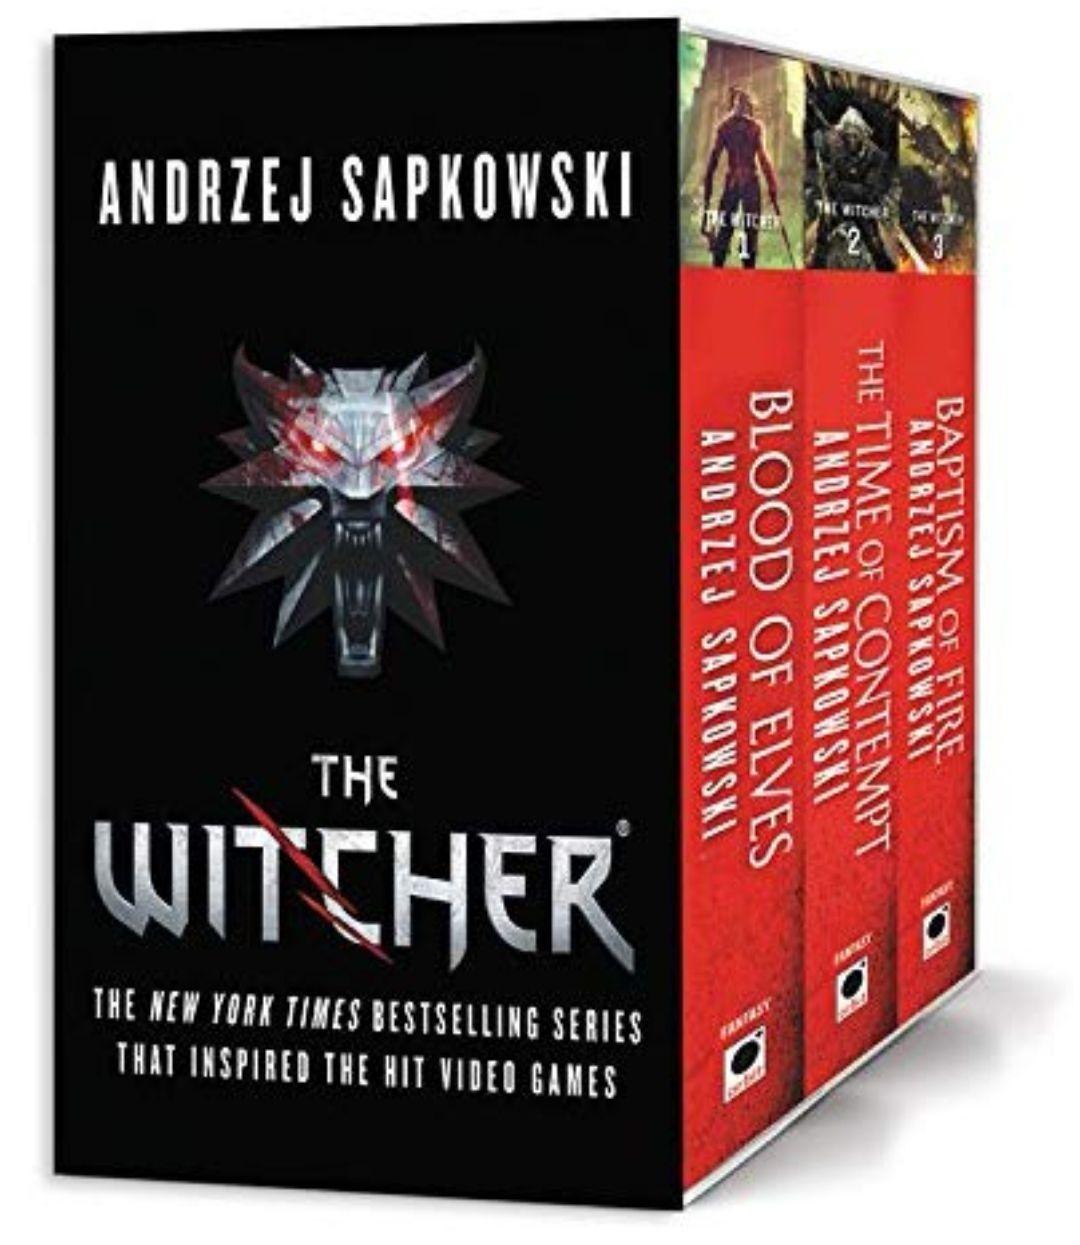 Amazon: Set de los 3 libros de the witcher